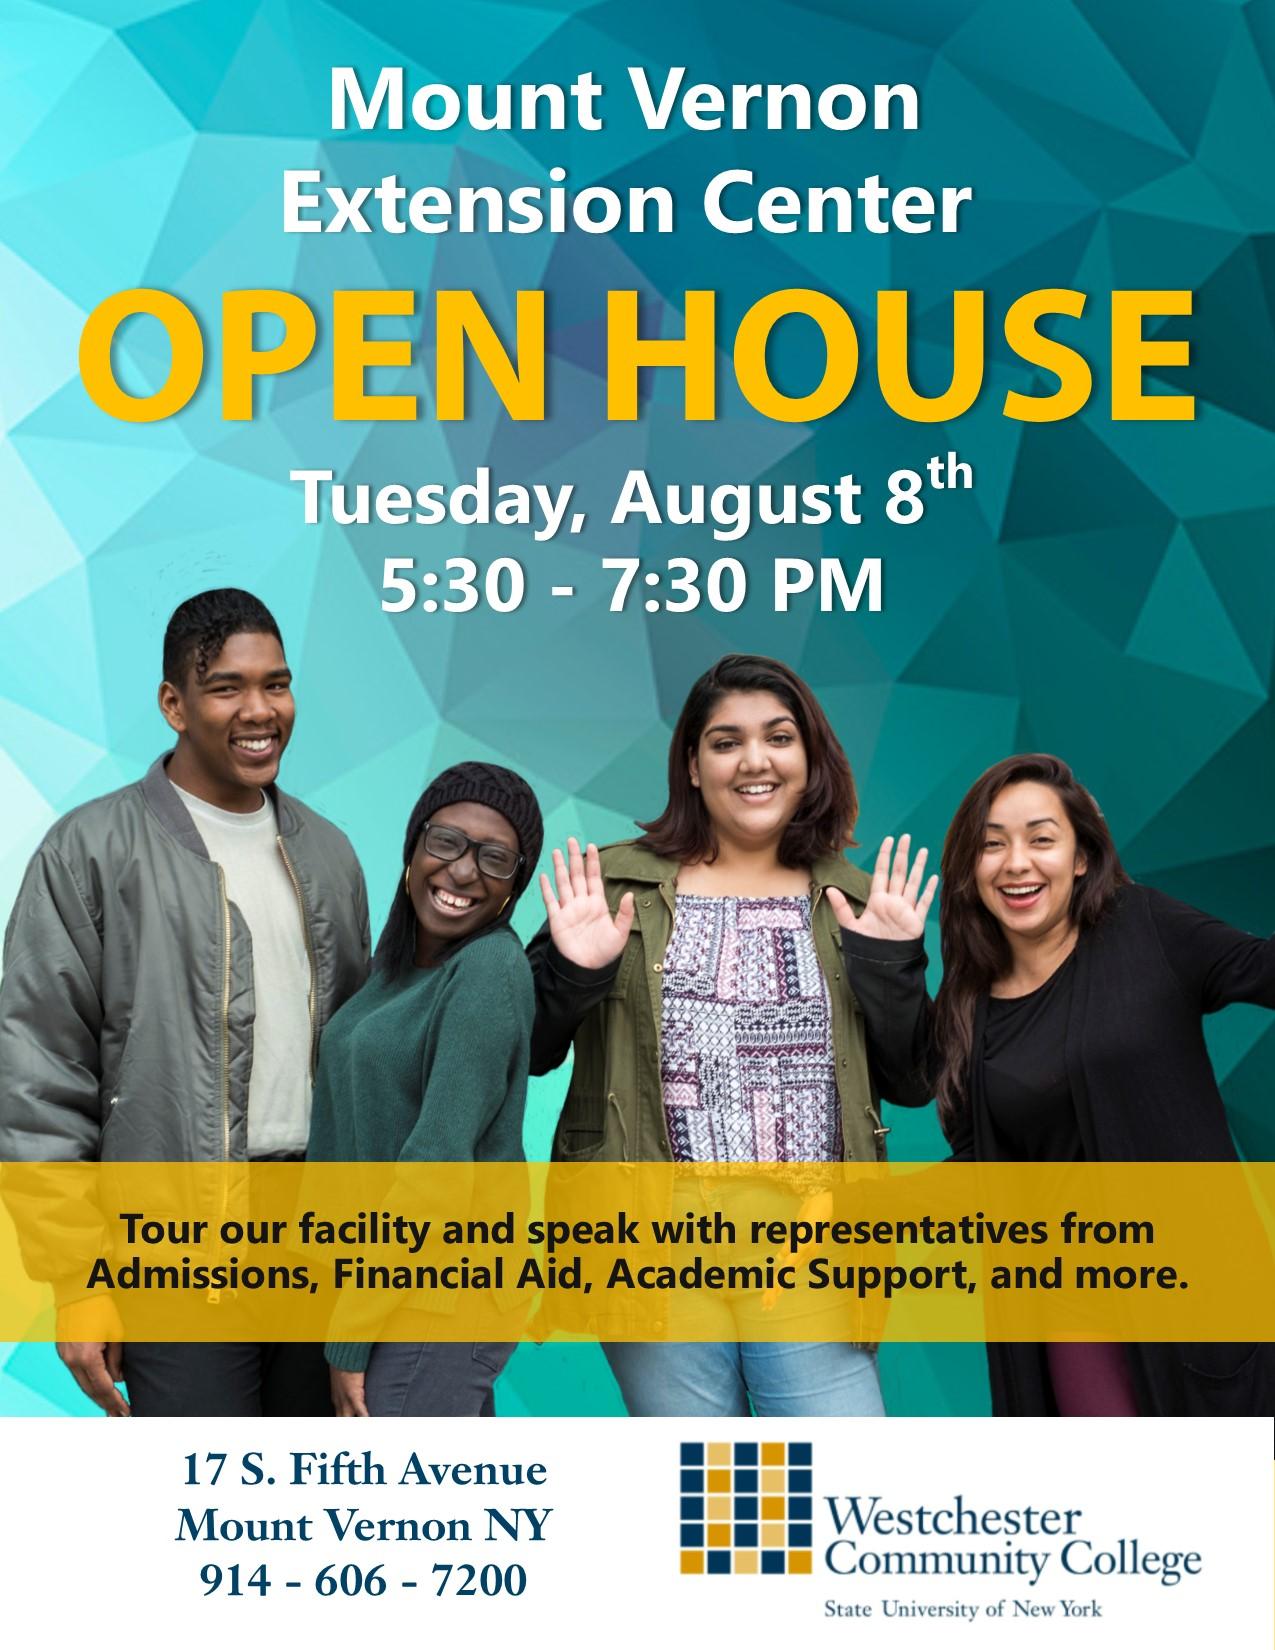 MV Open House 8.8.17 Flyer Final